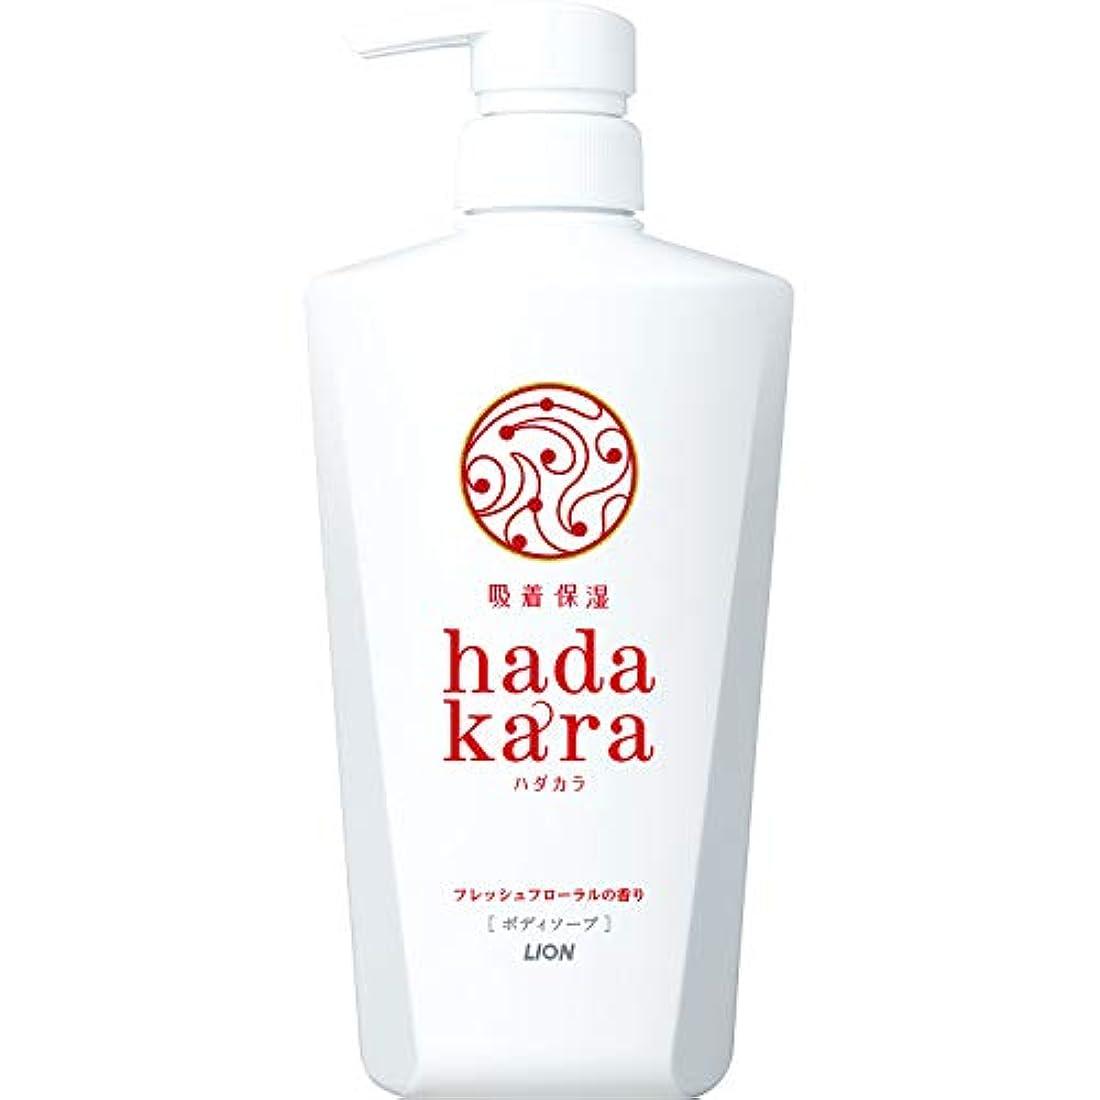 hadakara(ハダカラ) ボディソープ フローラルブーケの香り 本体 500ml